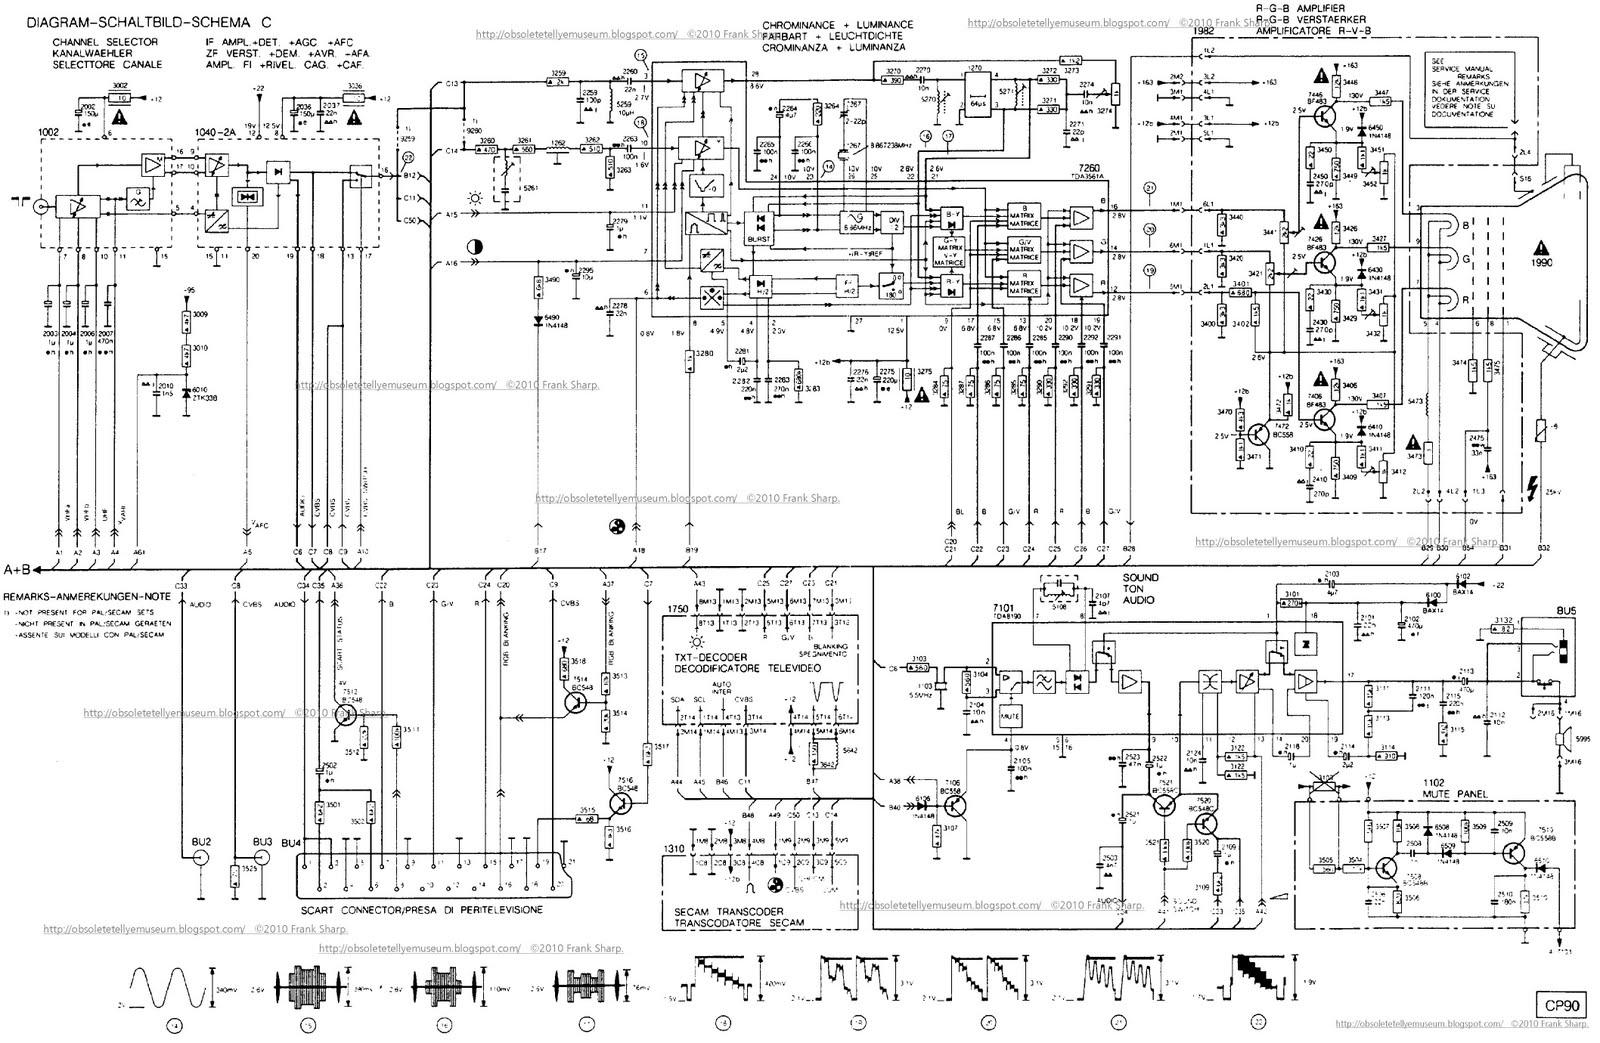 wiring diagram likewise bmw e38 radio wiring diagram on